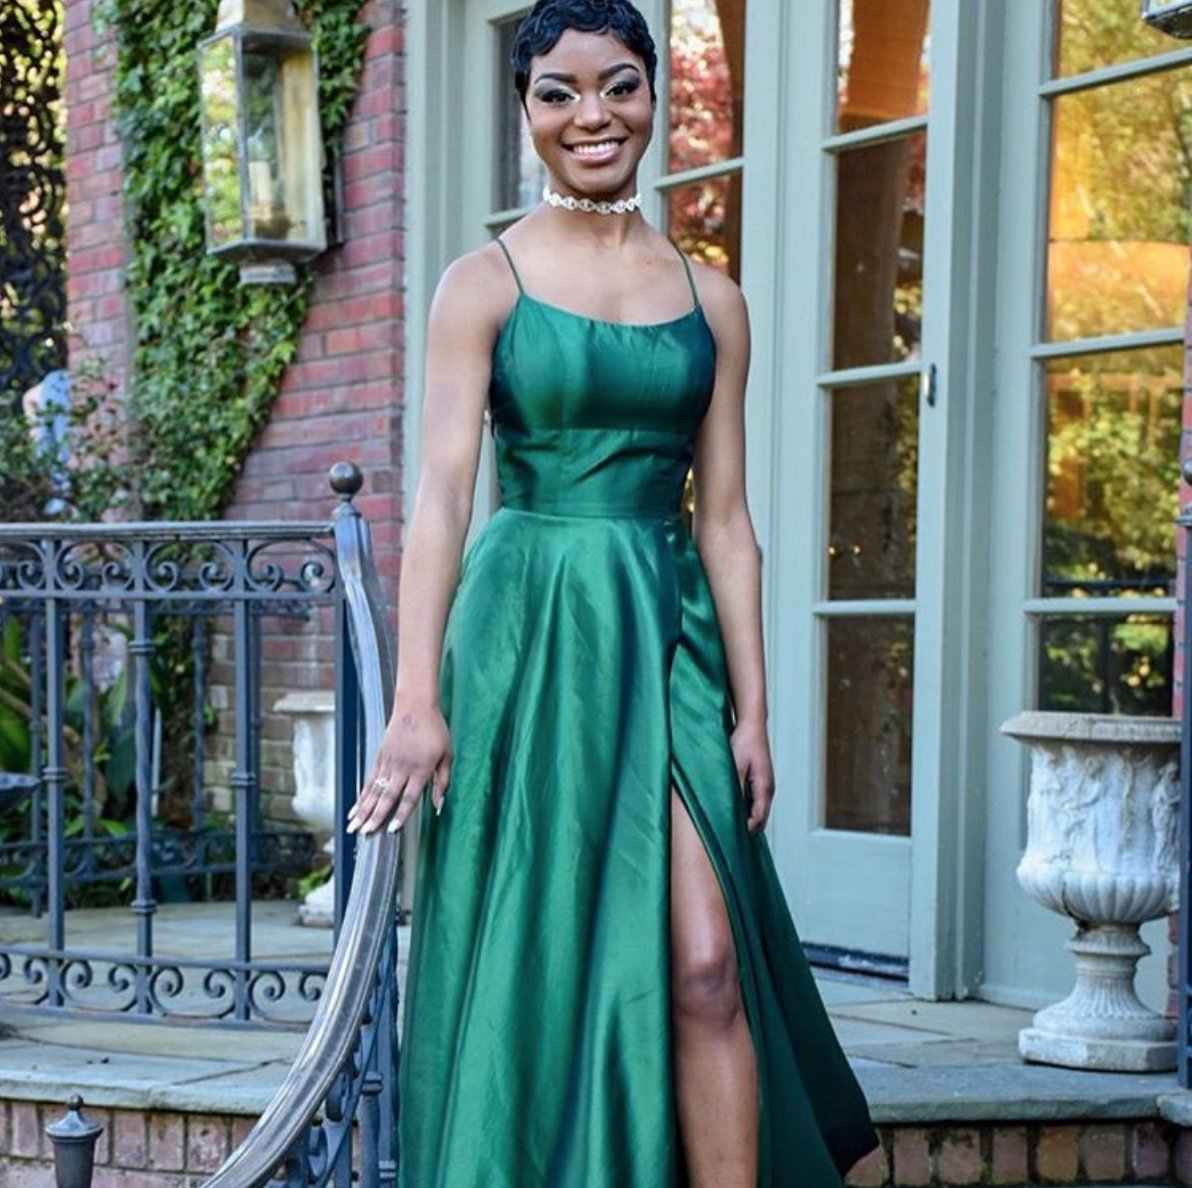 Amazing Prom Dresses Queens Ny Adornment - All Wedding Dresses ...